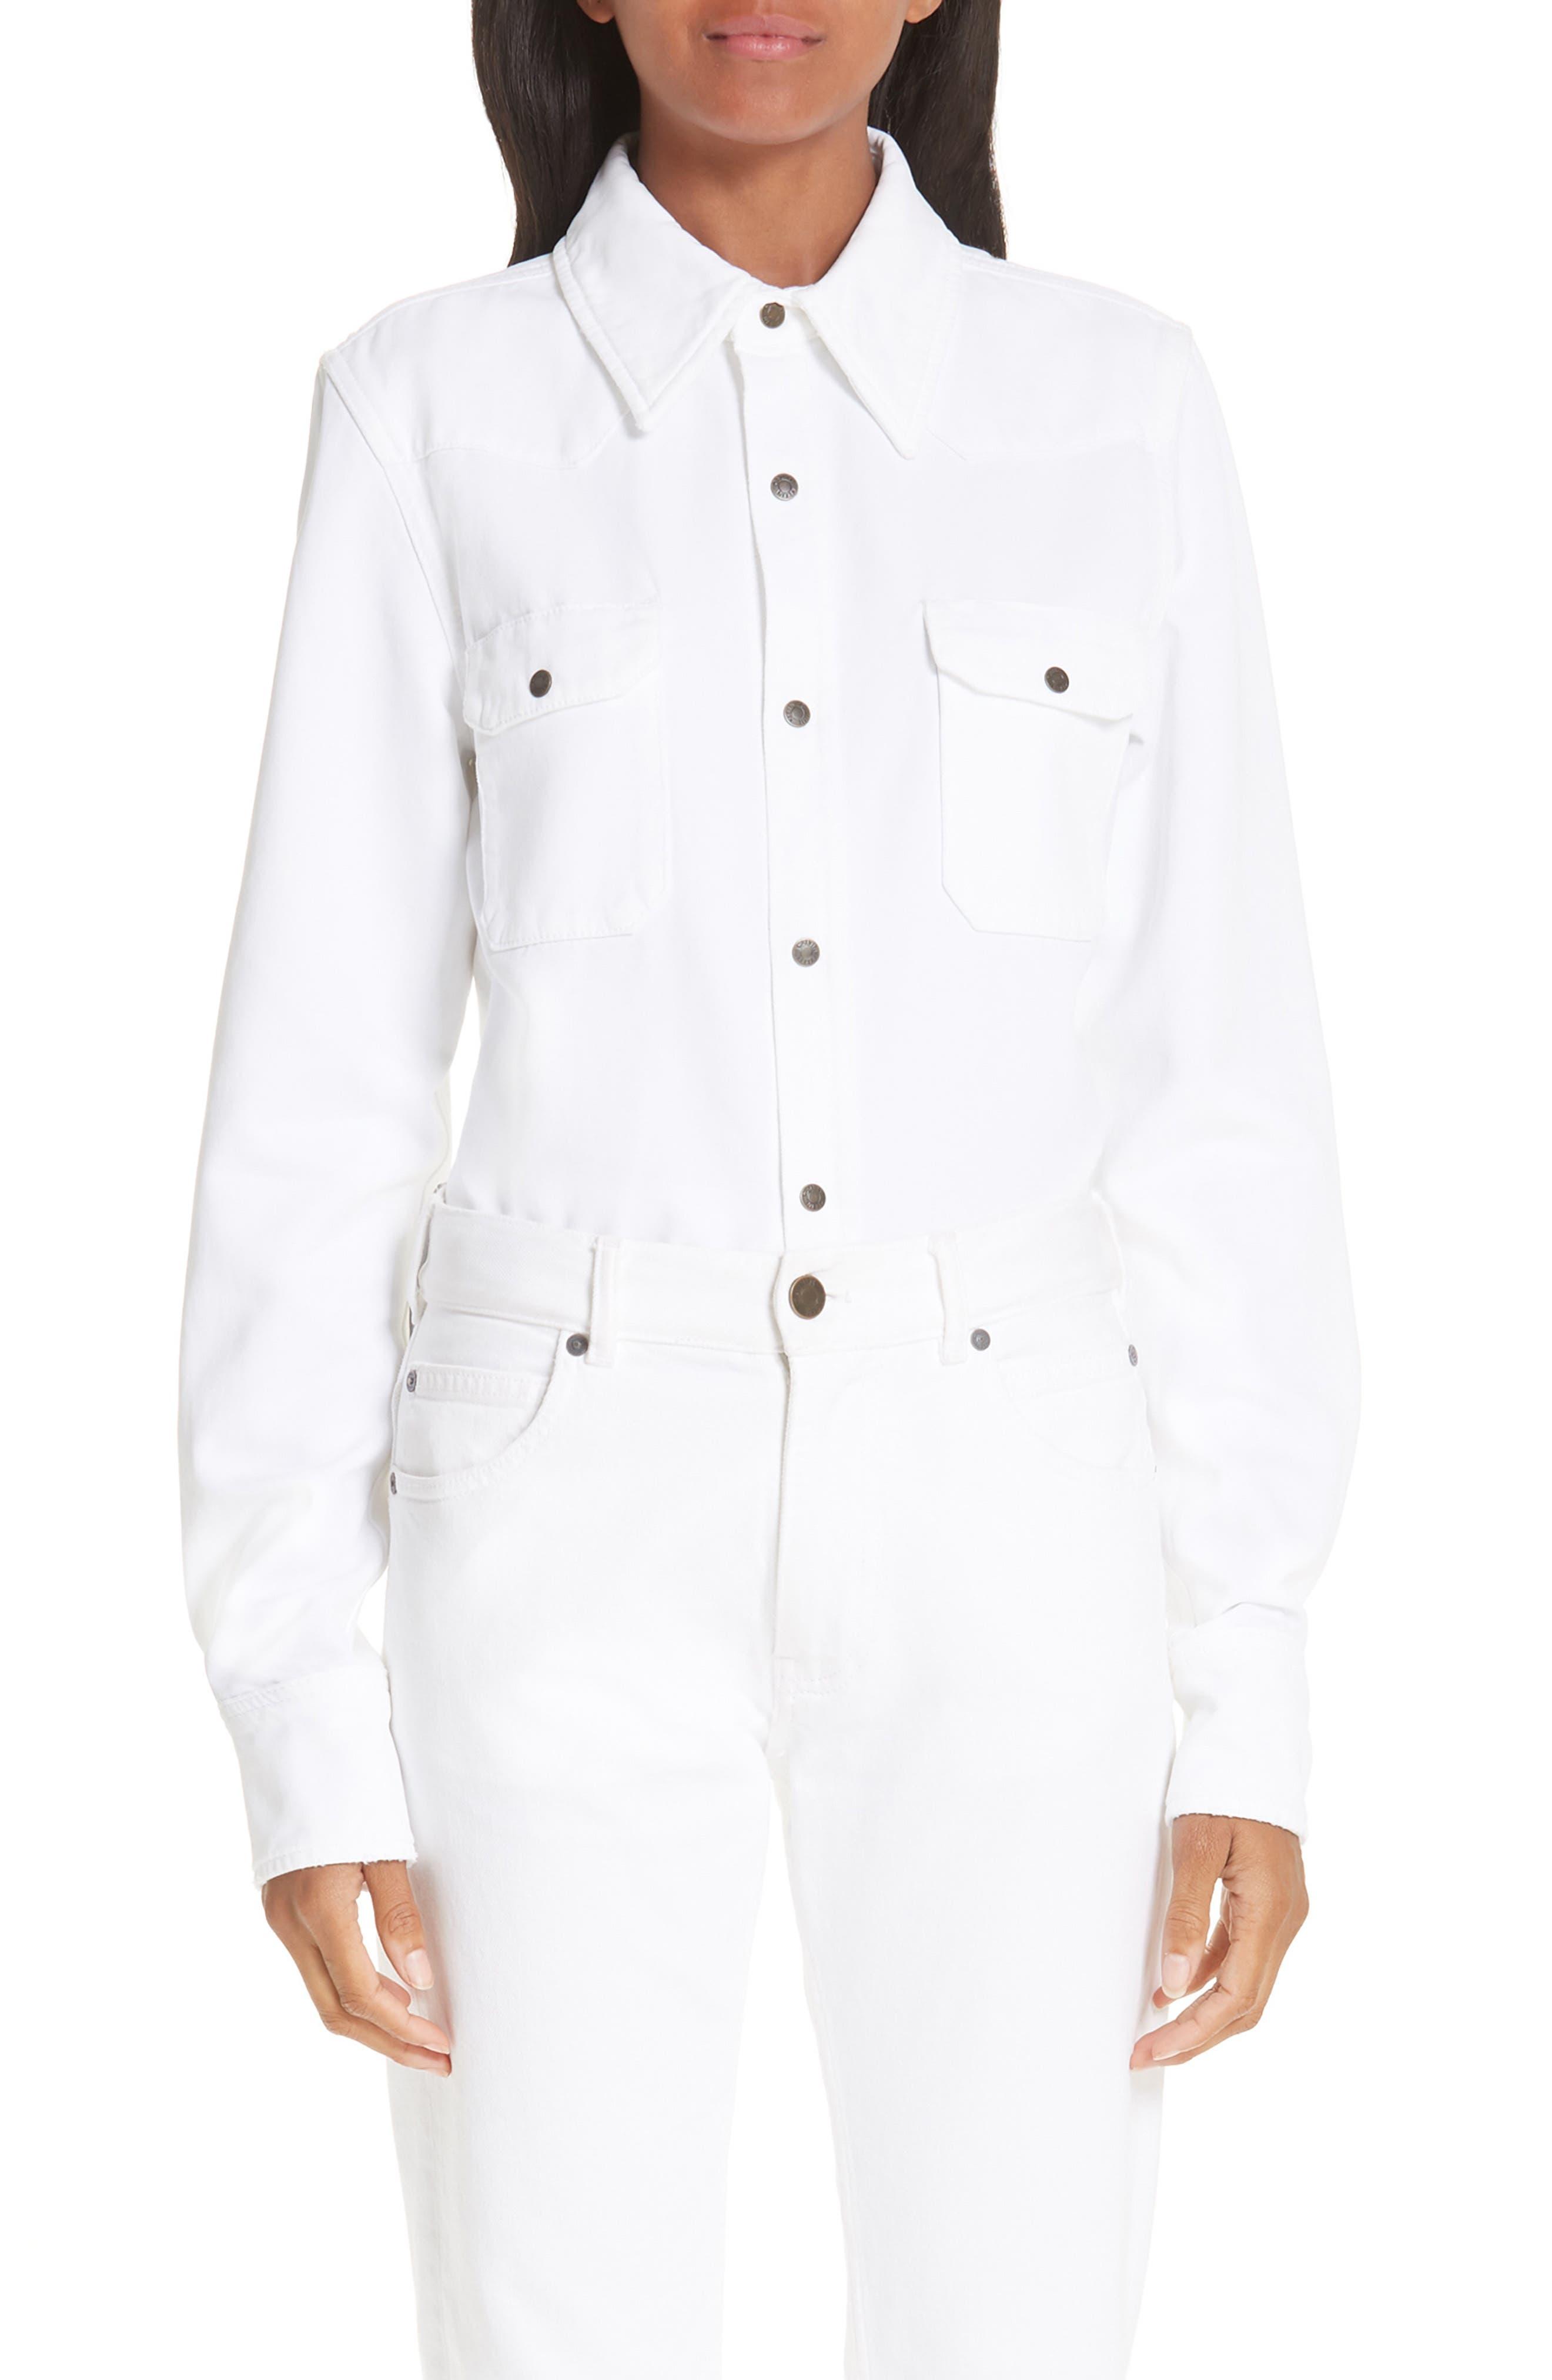 CALVIN KLEIN 205W39NYC, Denim Shirt, Main thumbnail 1, color, OPTIC WHITE